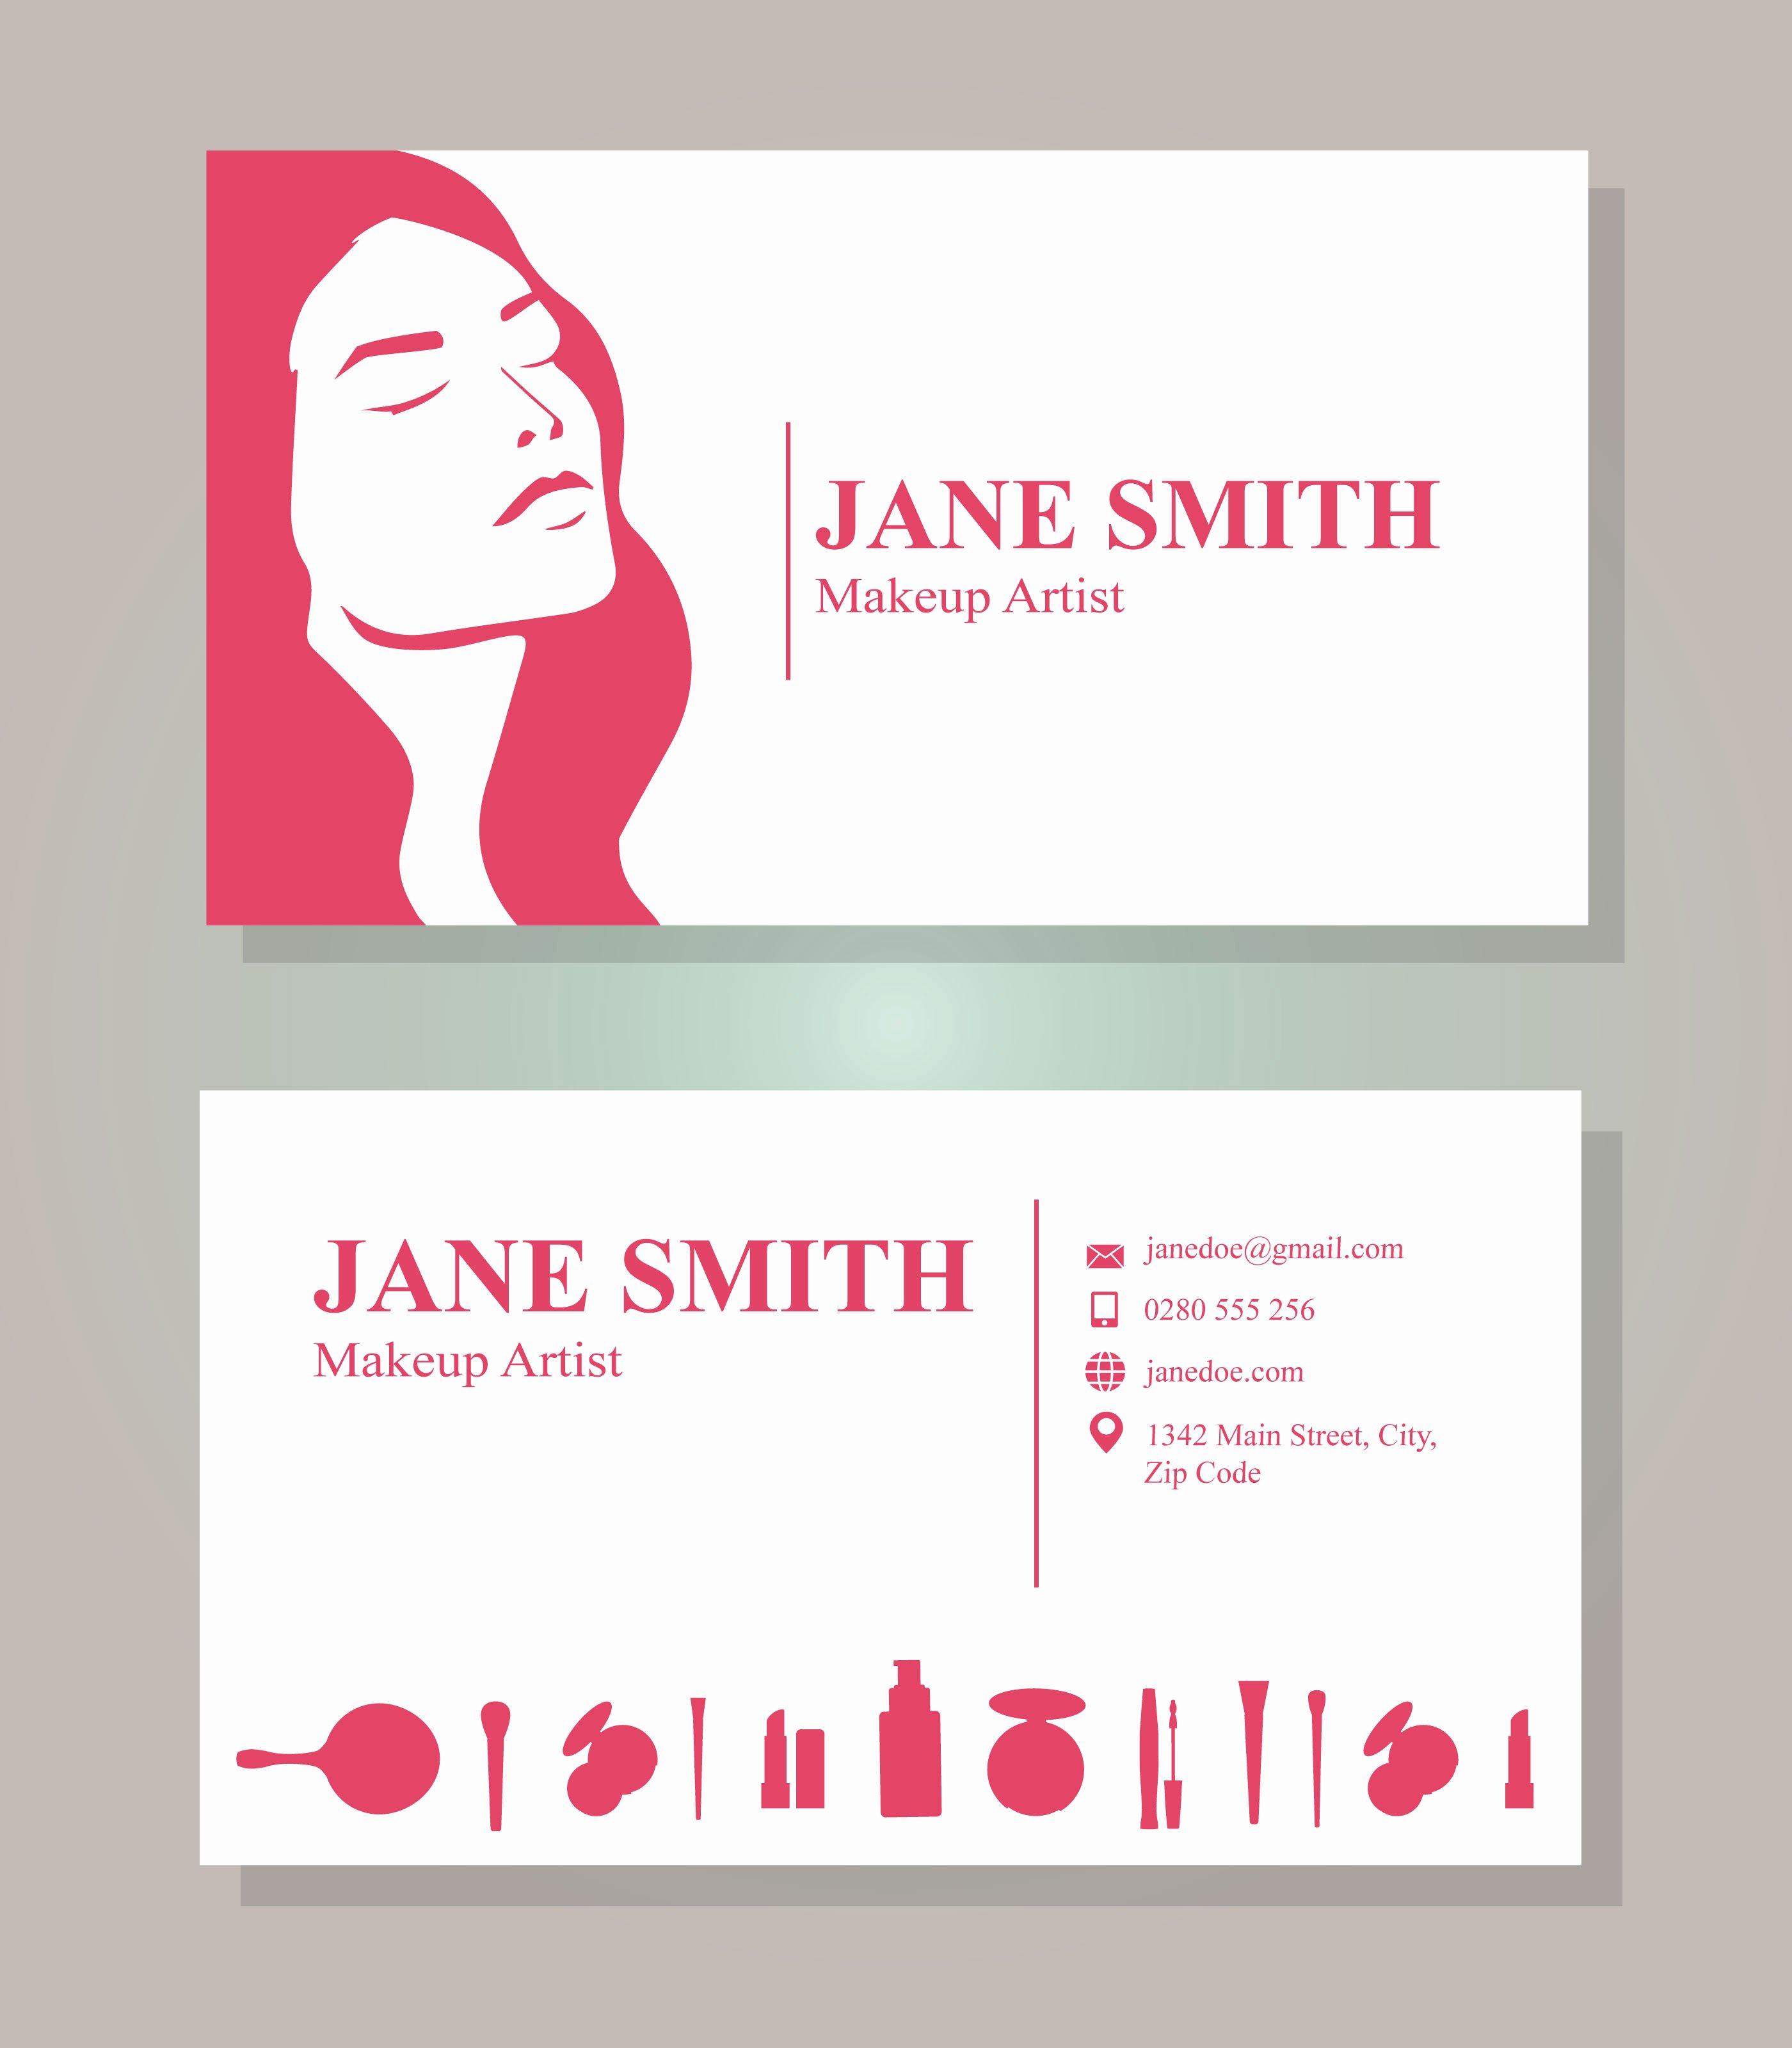 Makeup Artist Business Cards Best Of Makeup Artist Business Card Template Download Free Vector Art Stock Graphics &